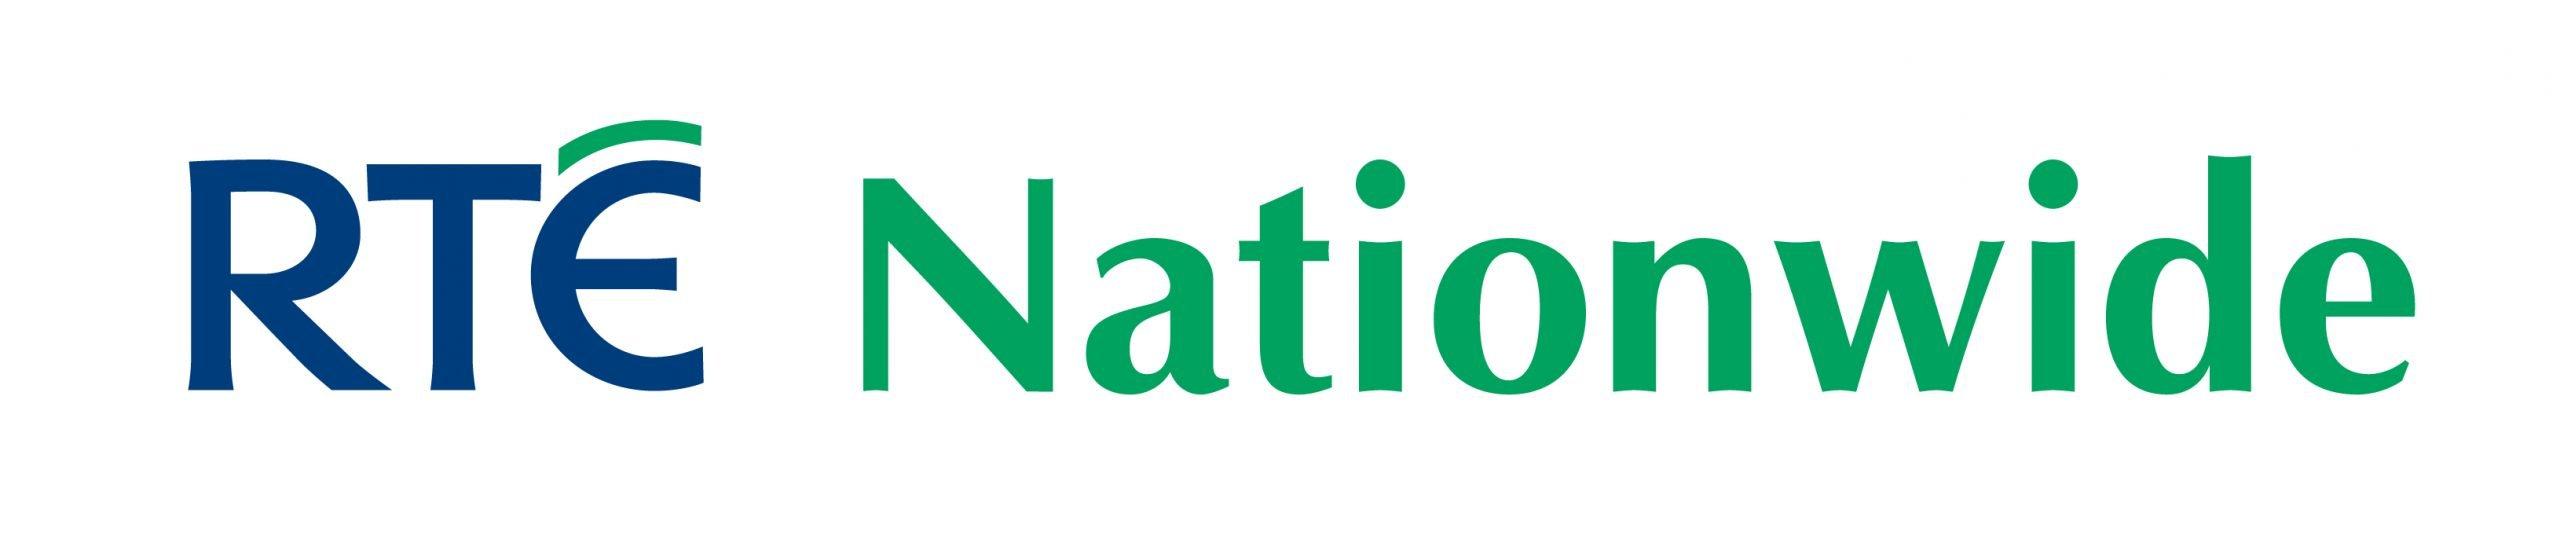 rte-nationwide